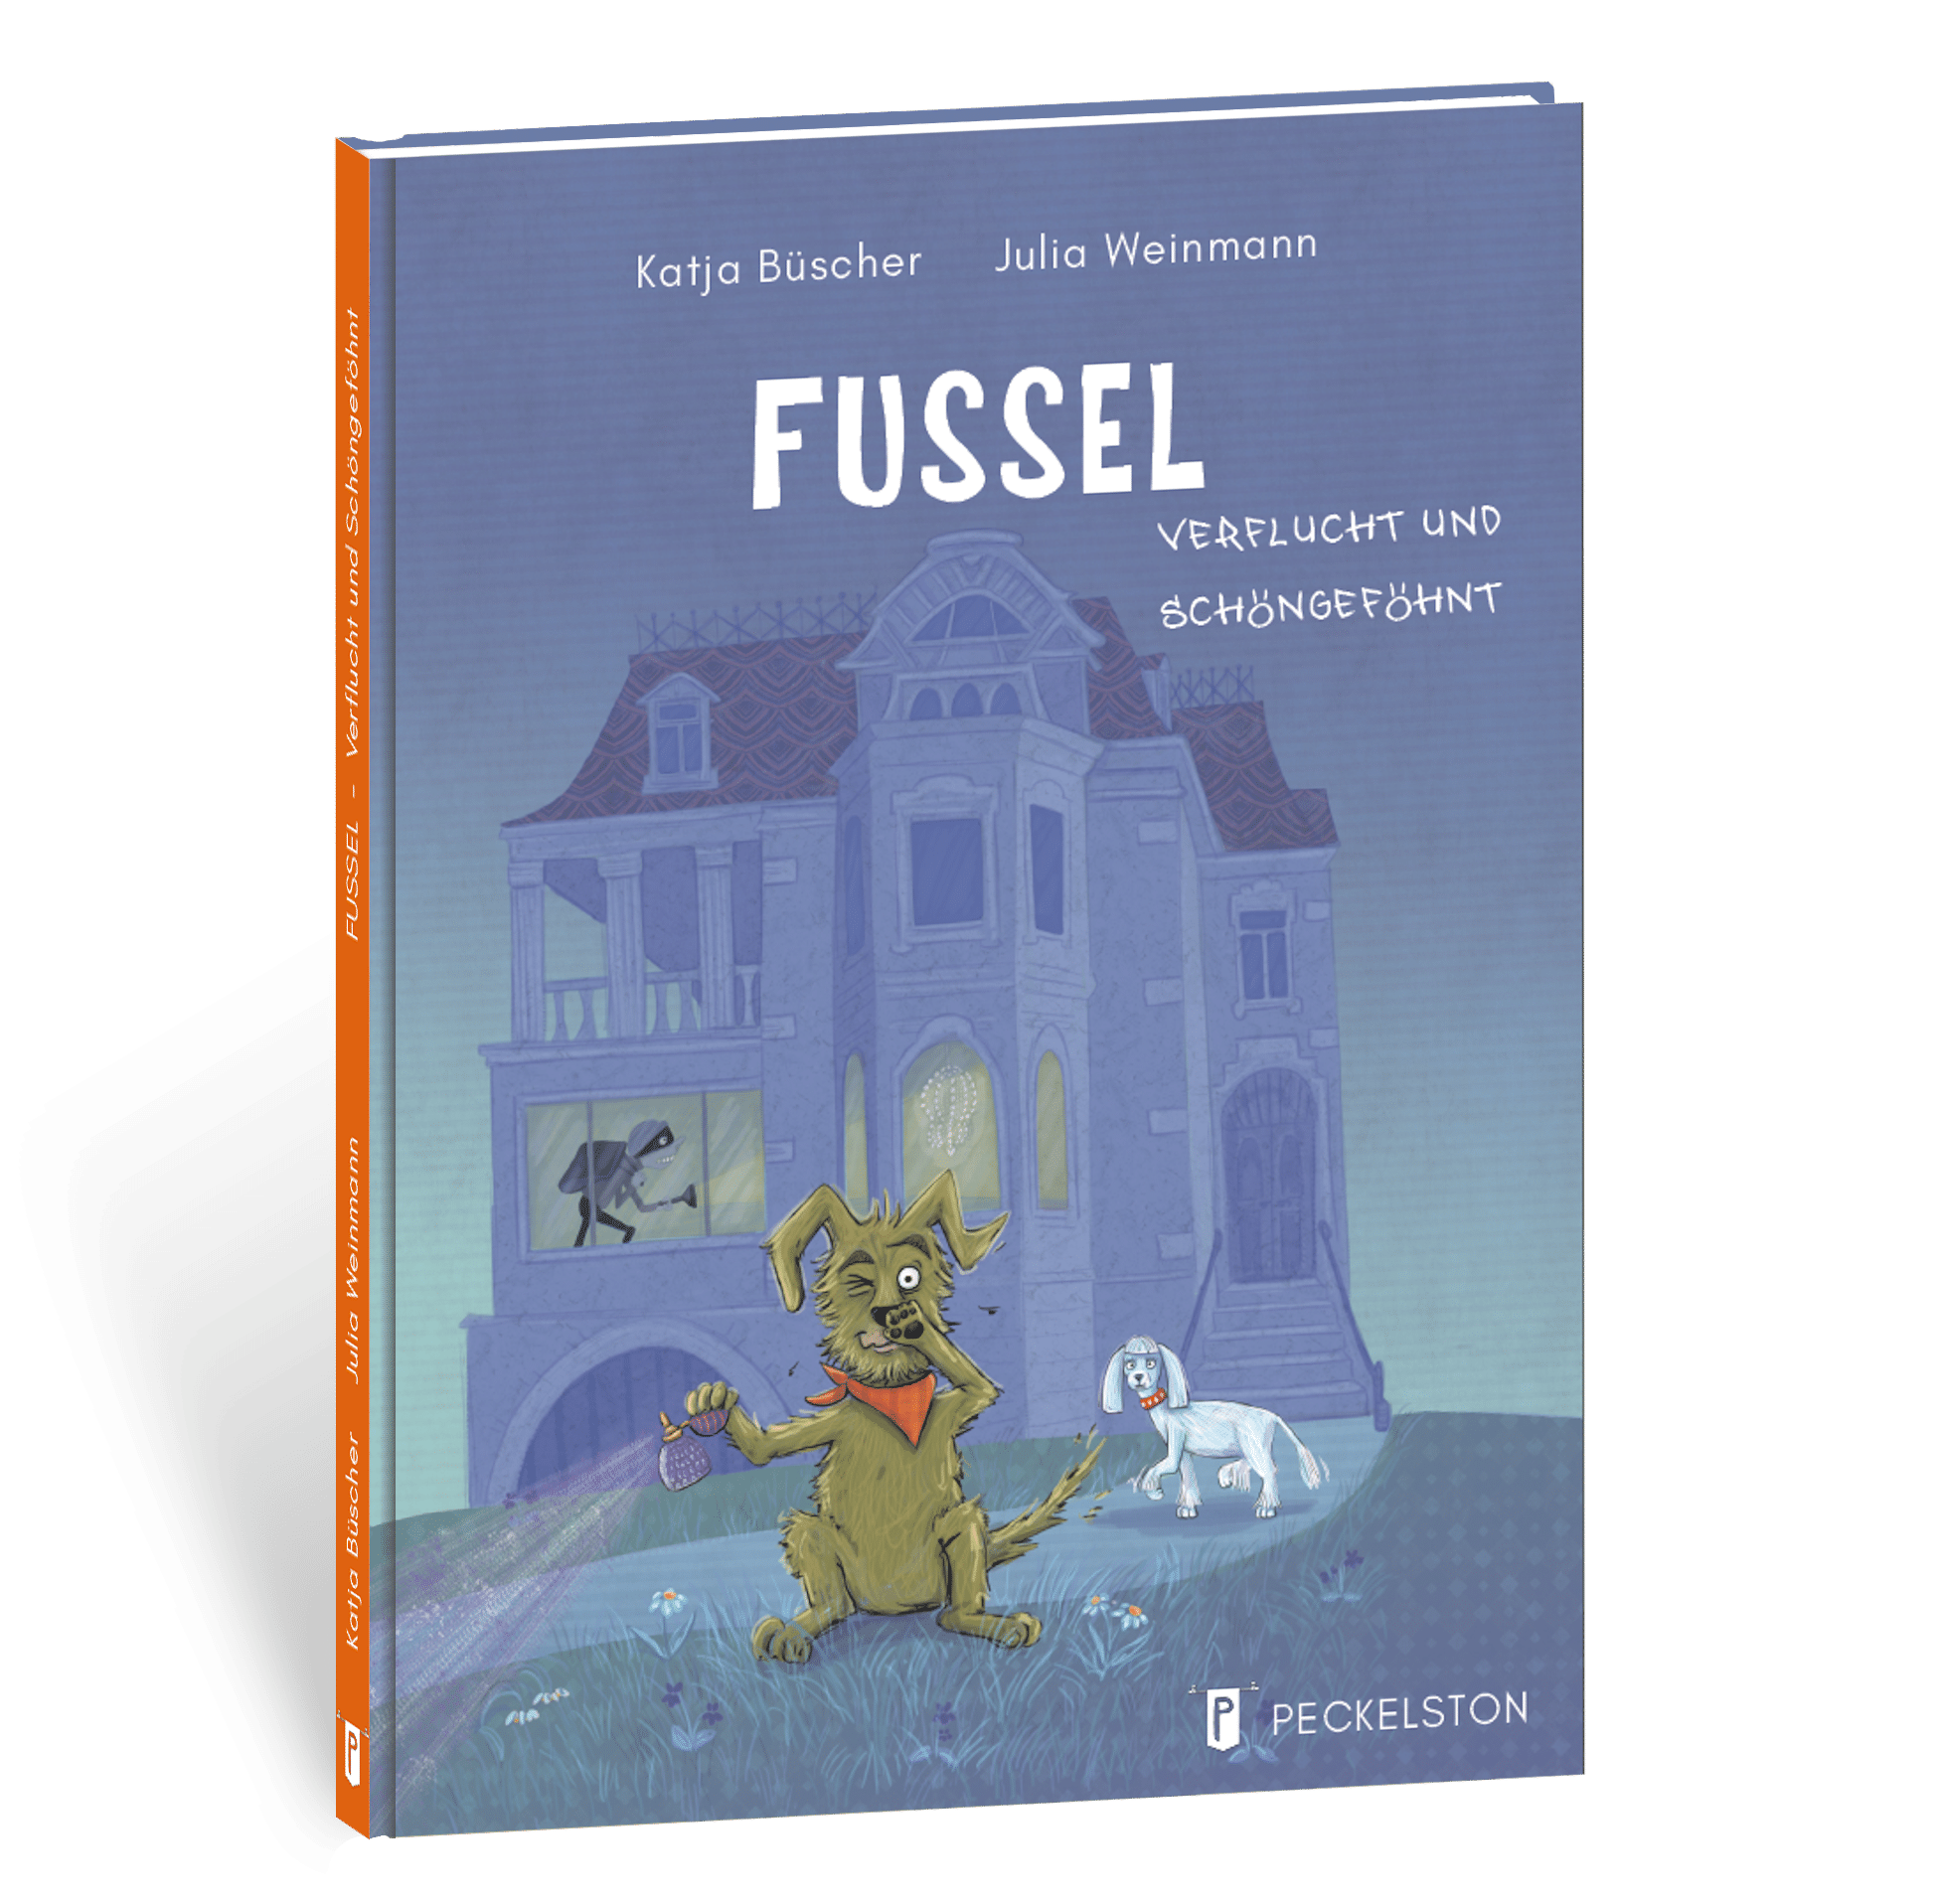 katja büscher fussel peckelston kinderbuchverlag Julia Weinmann